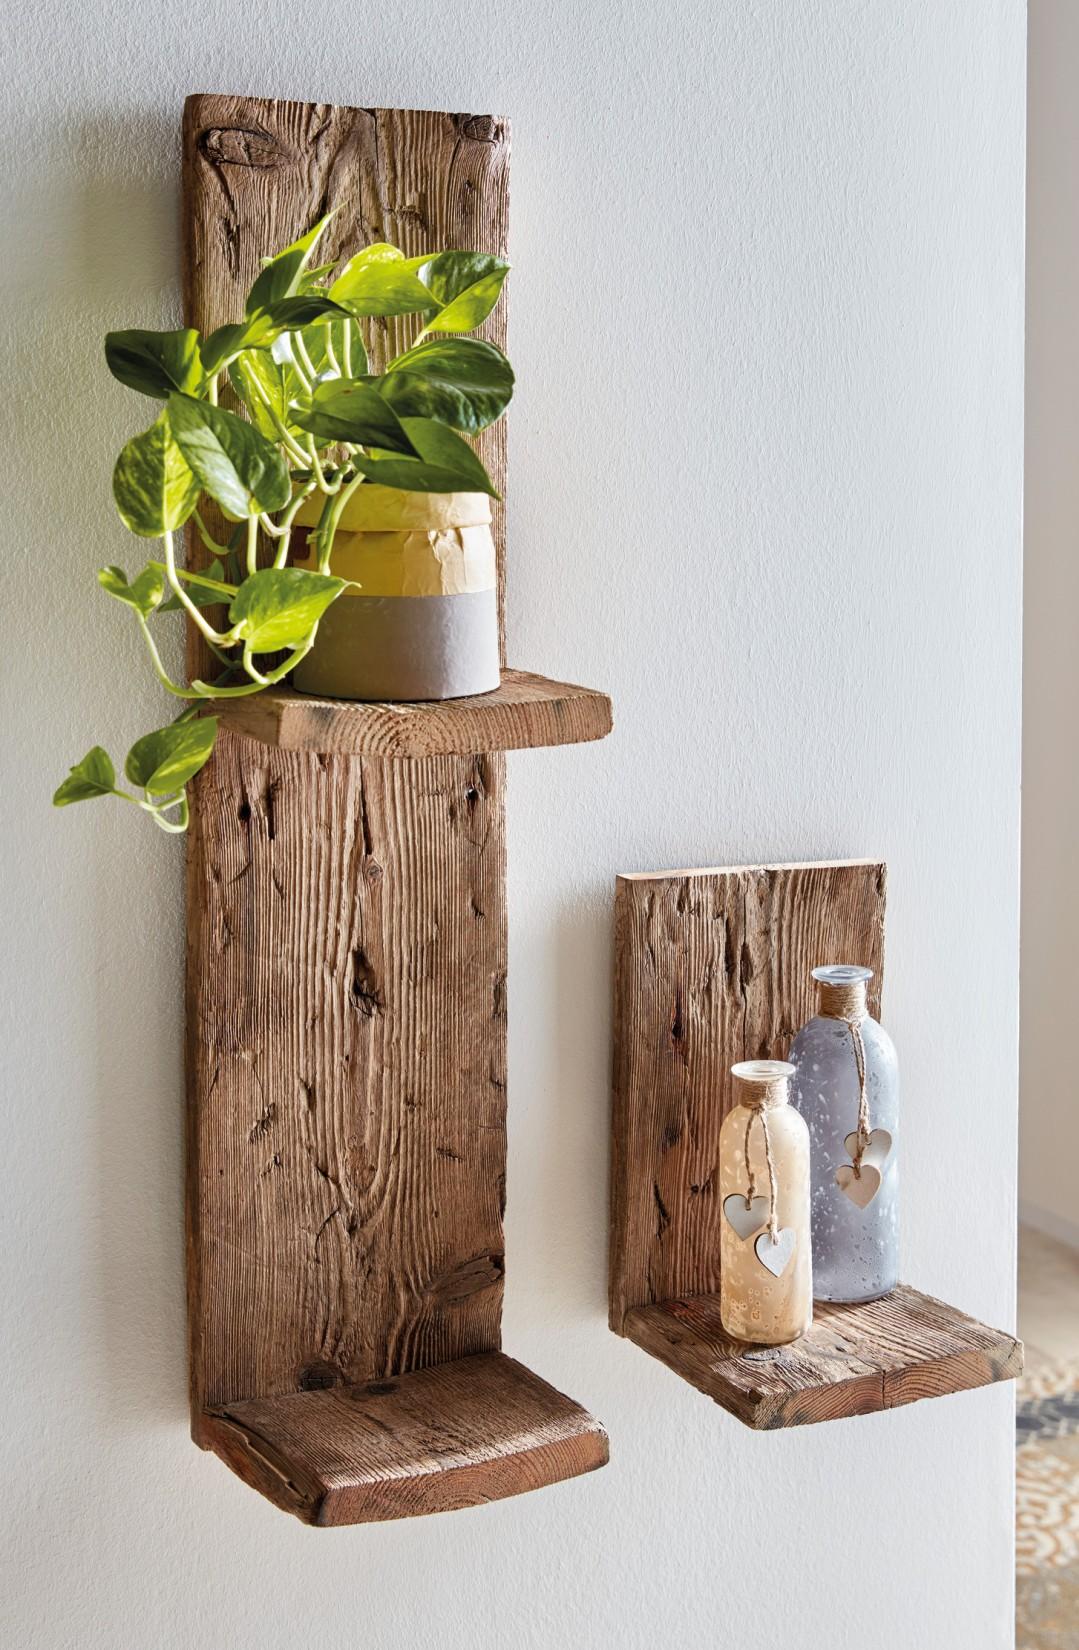 Wand Regal Aus Recyceltem Paletten Holz Klein Blumen Hange Board